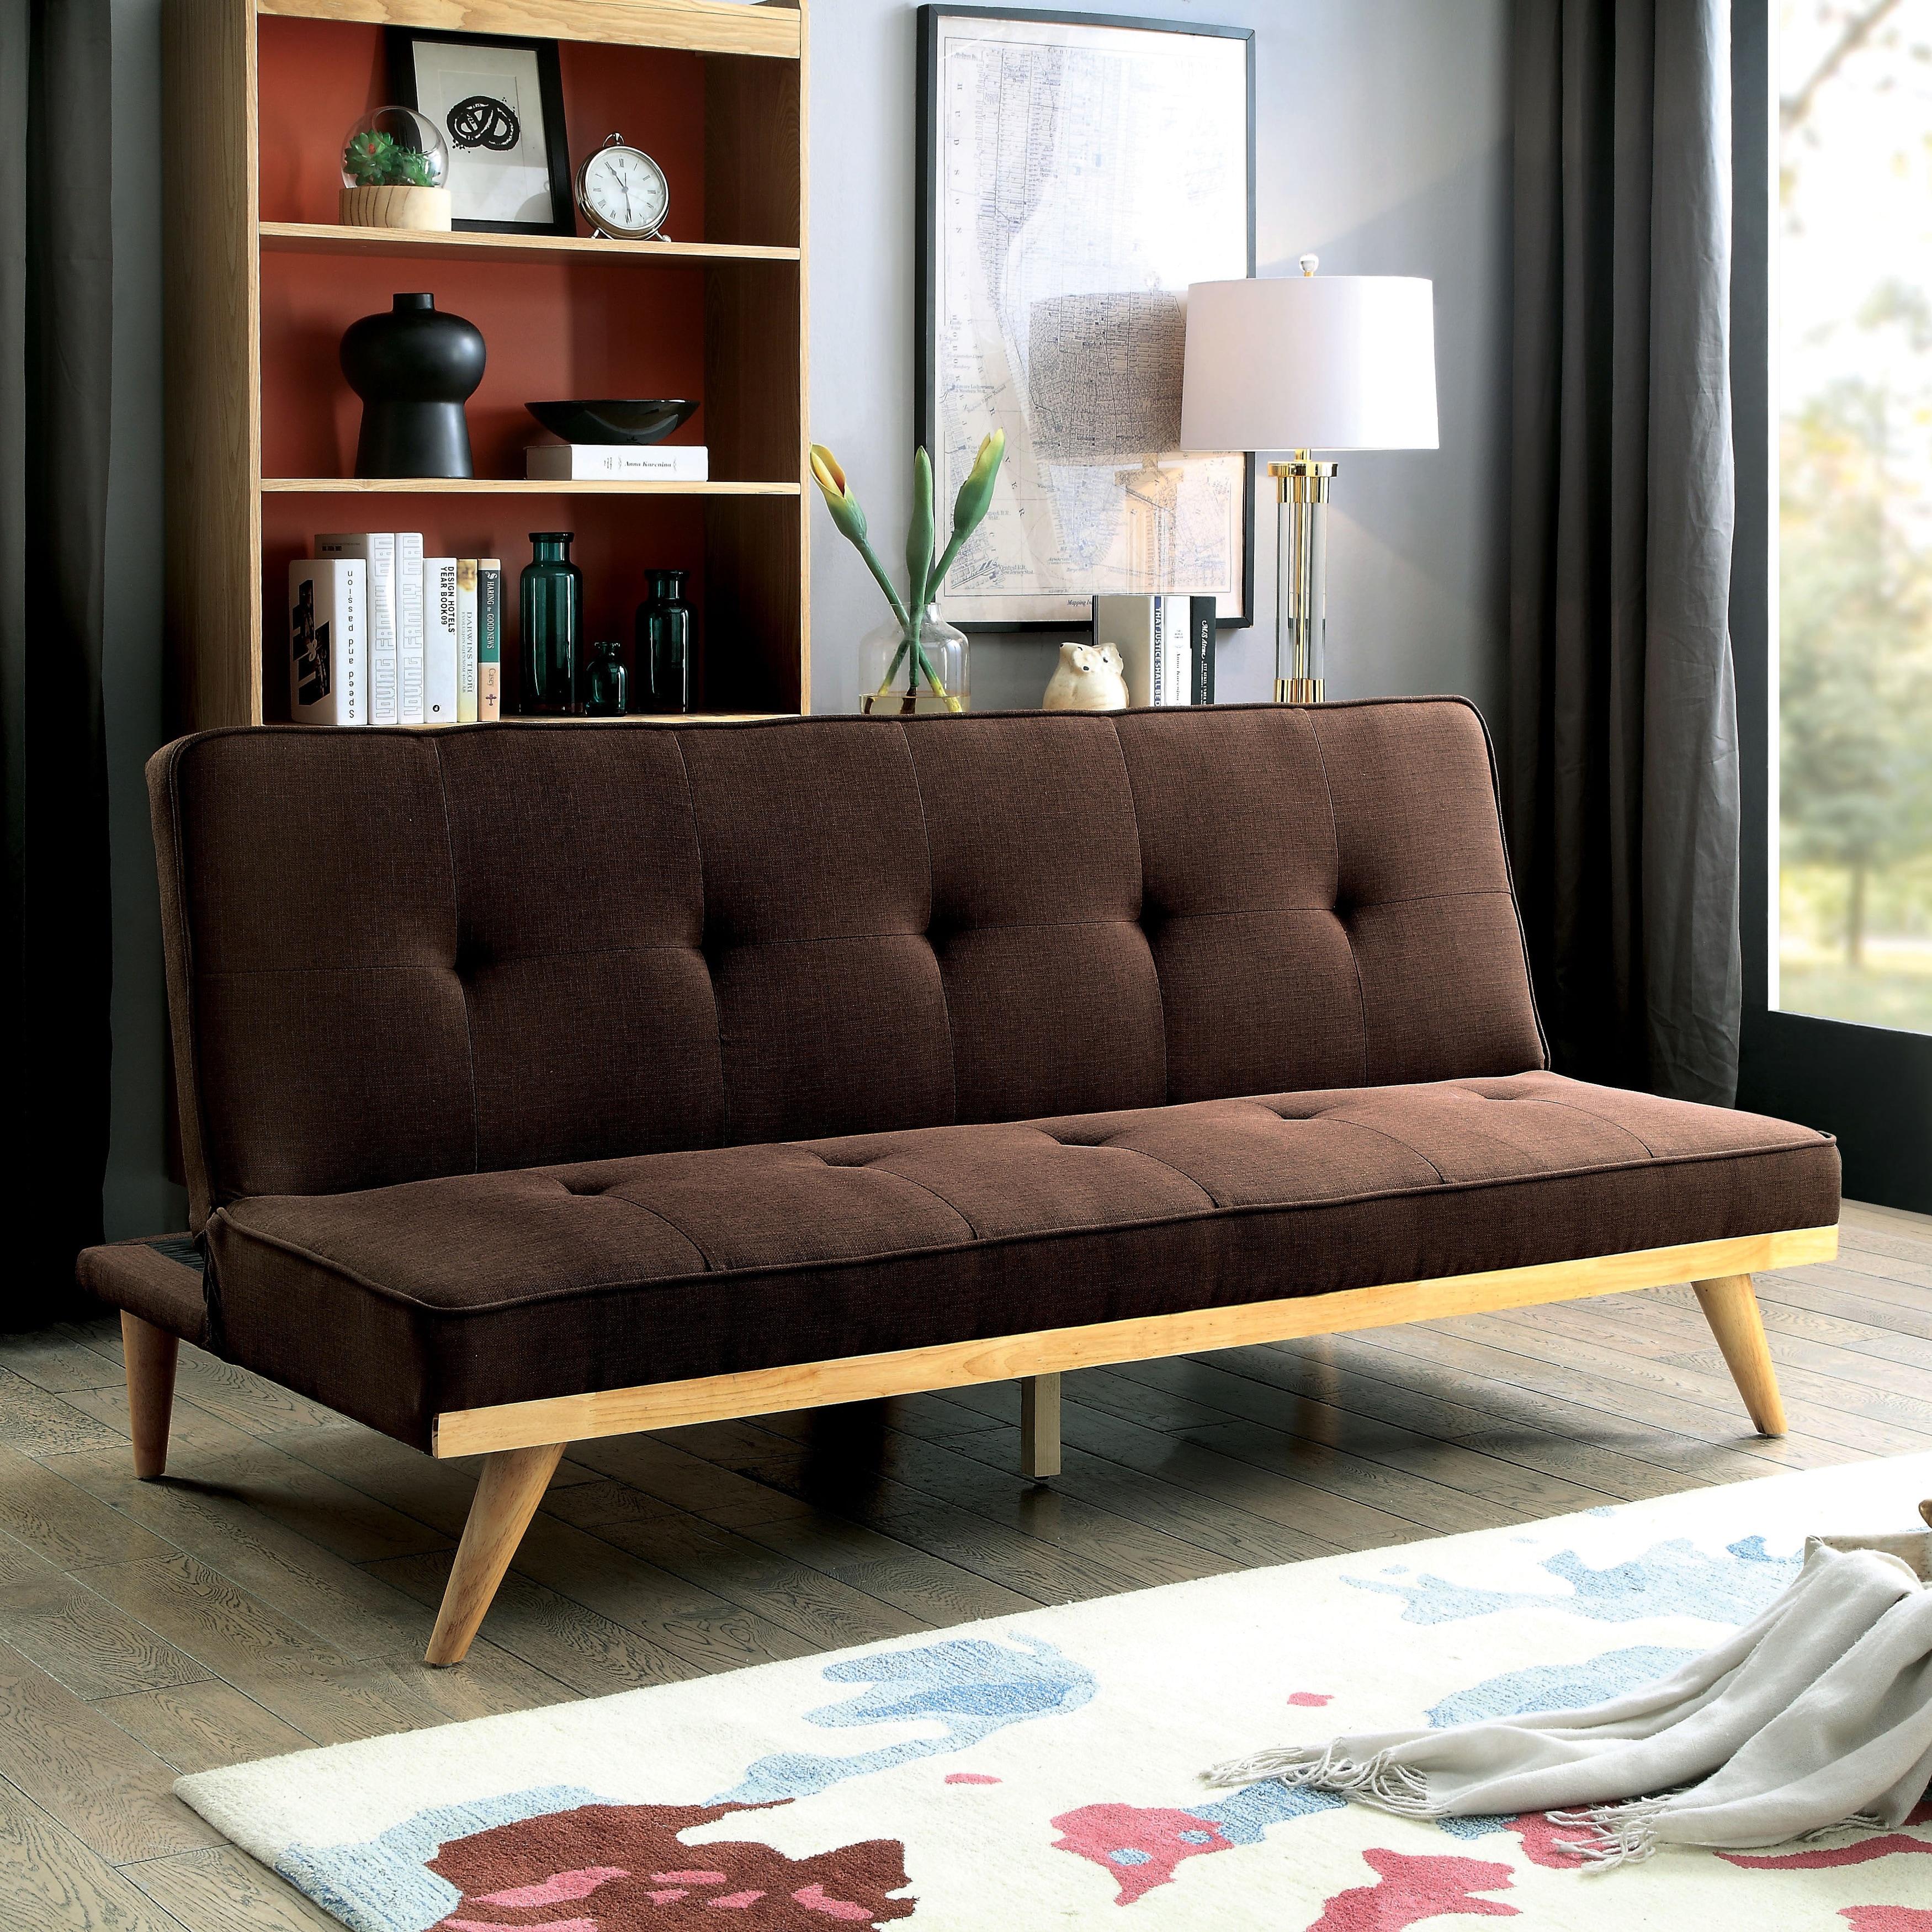 Modern Tufted Futon Sofa Bed Modern Futon Sofa Bed Roselawnlutheran Thesofa